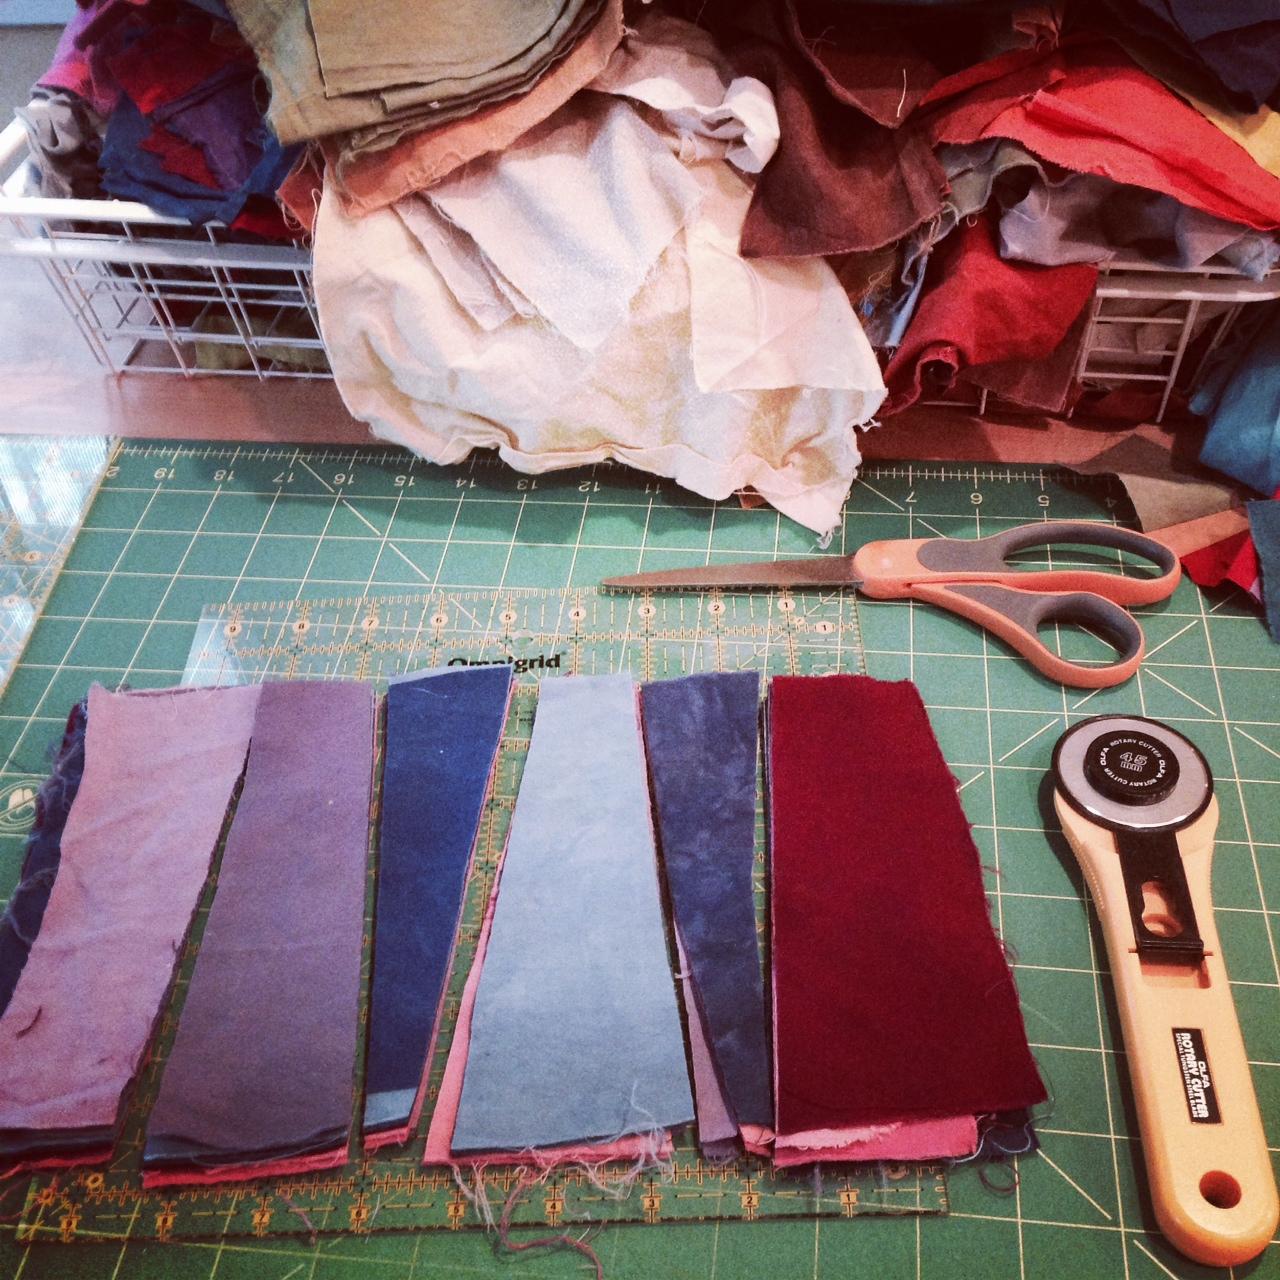 Cutting angled stripes